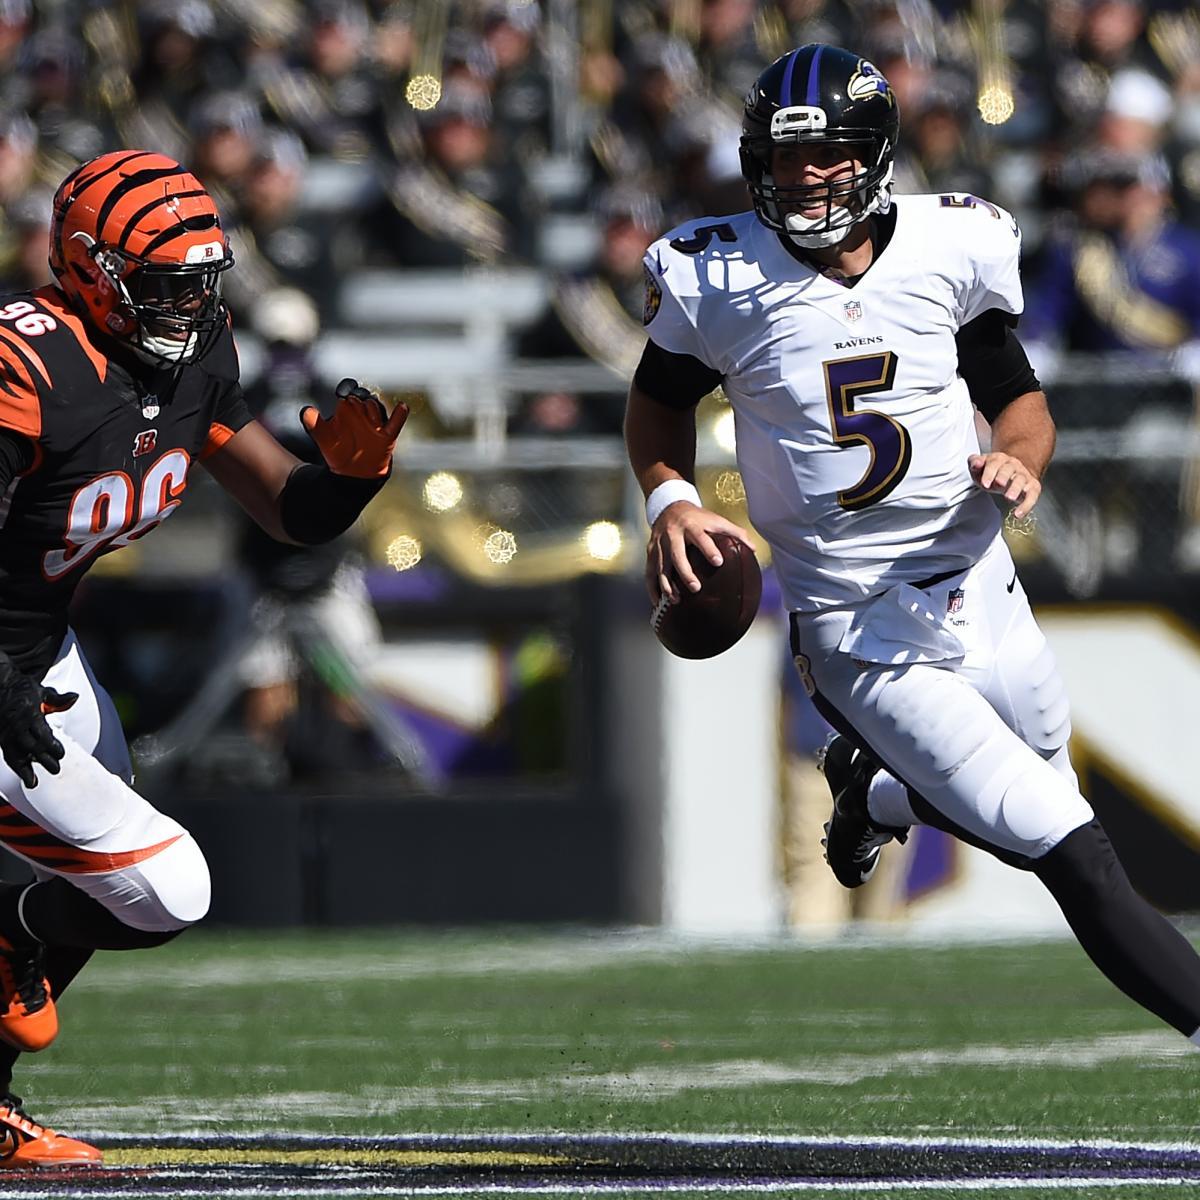 Denver Broncos Vs Detroit Lions Live Score Highlights And: Week 8 NFL Picks: Vegas Odds, Spread Advice And